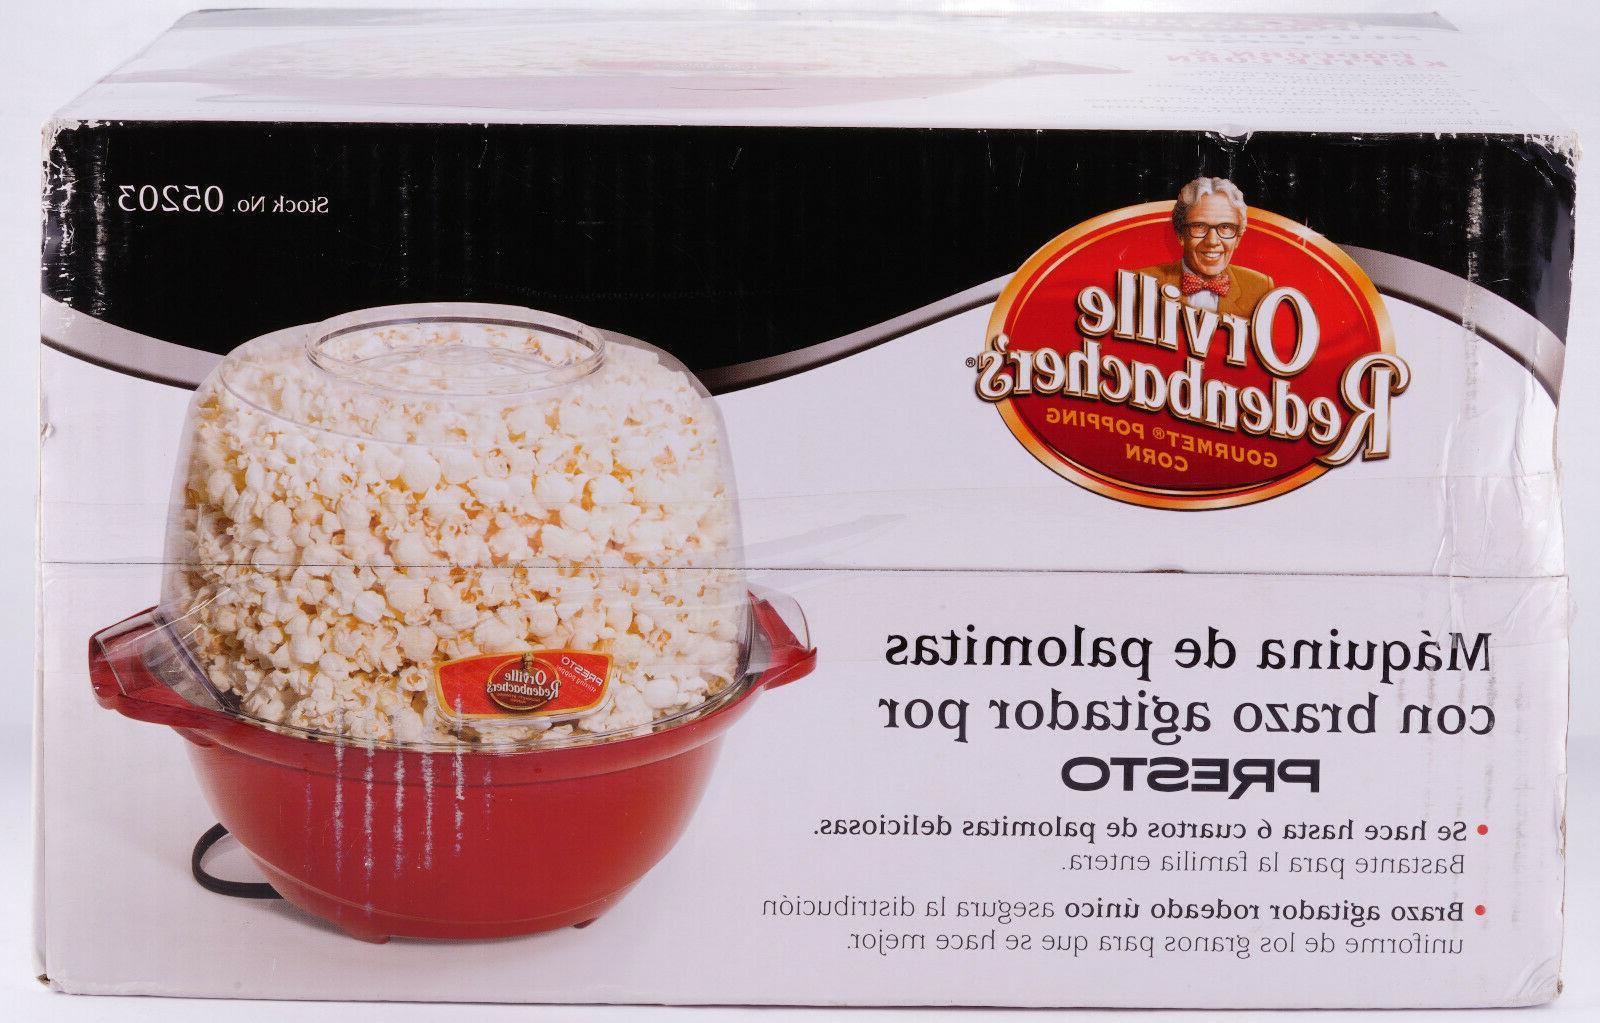 Popcorn Stirring Orville Redenbacher's 6 Brand New